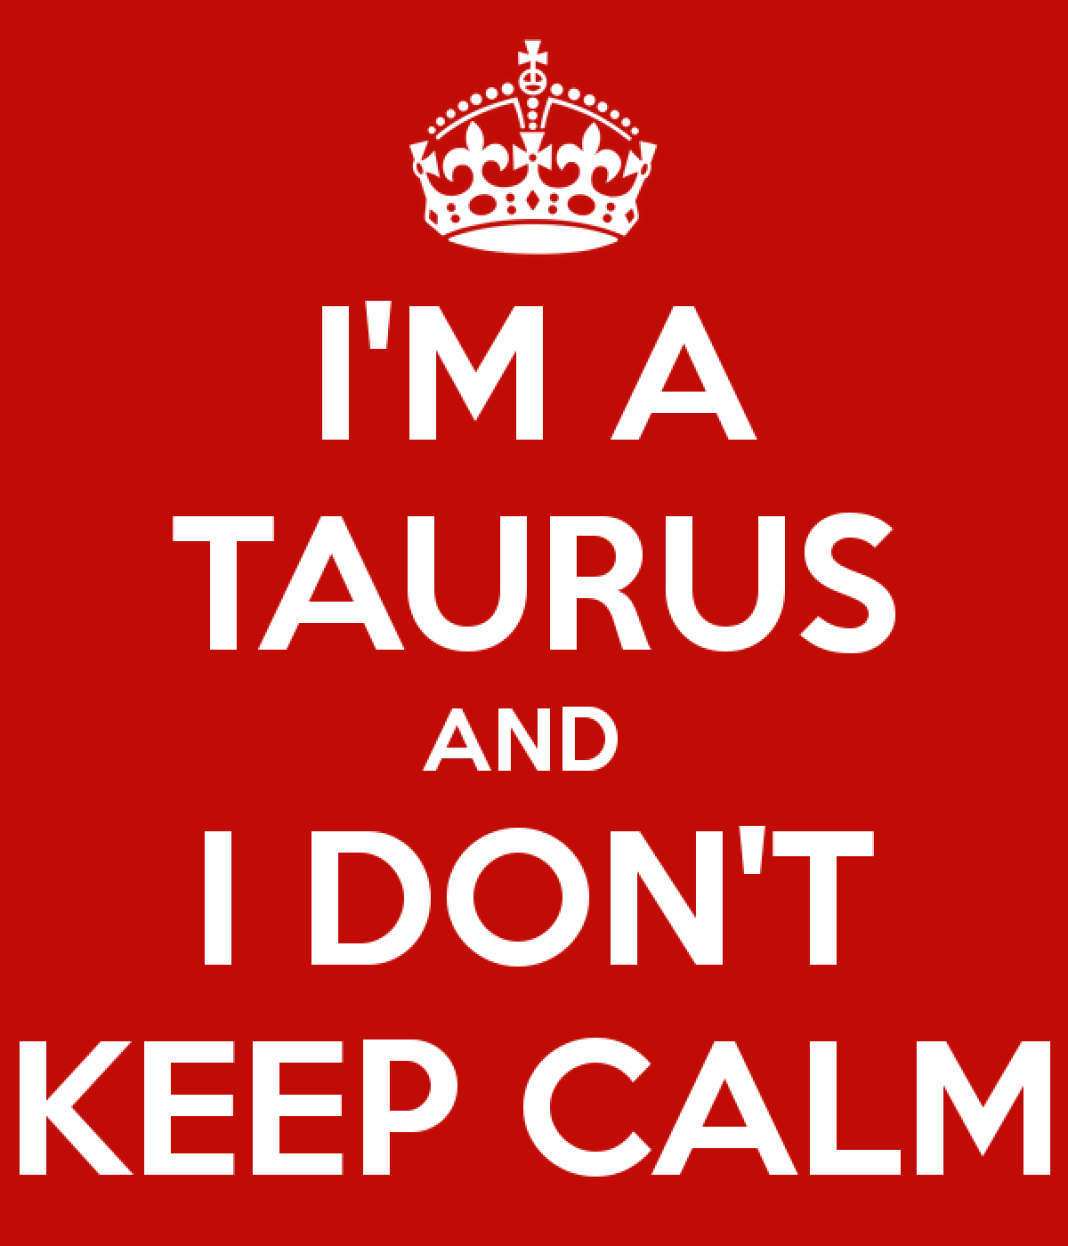 i-m-a-taurus-and-i-don-t-keep-calm-2